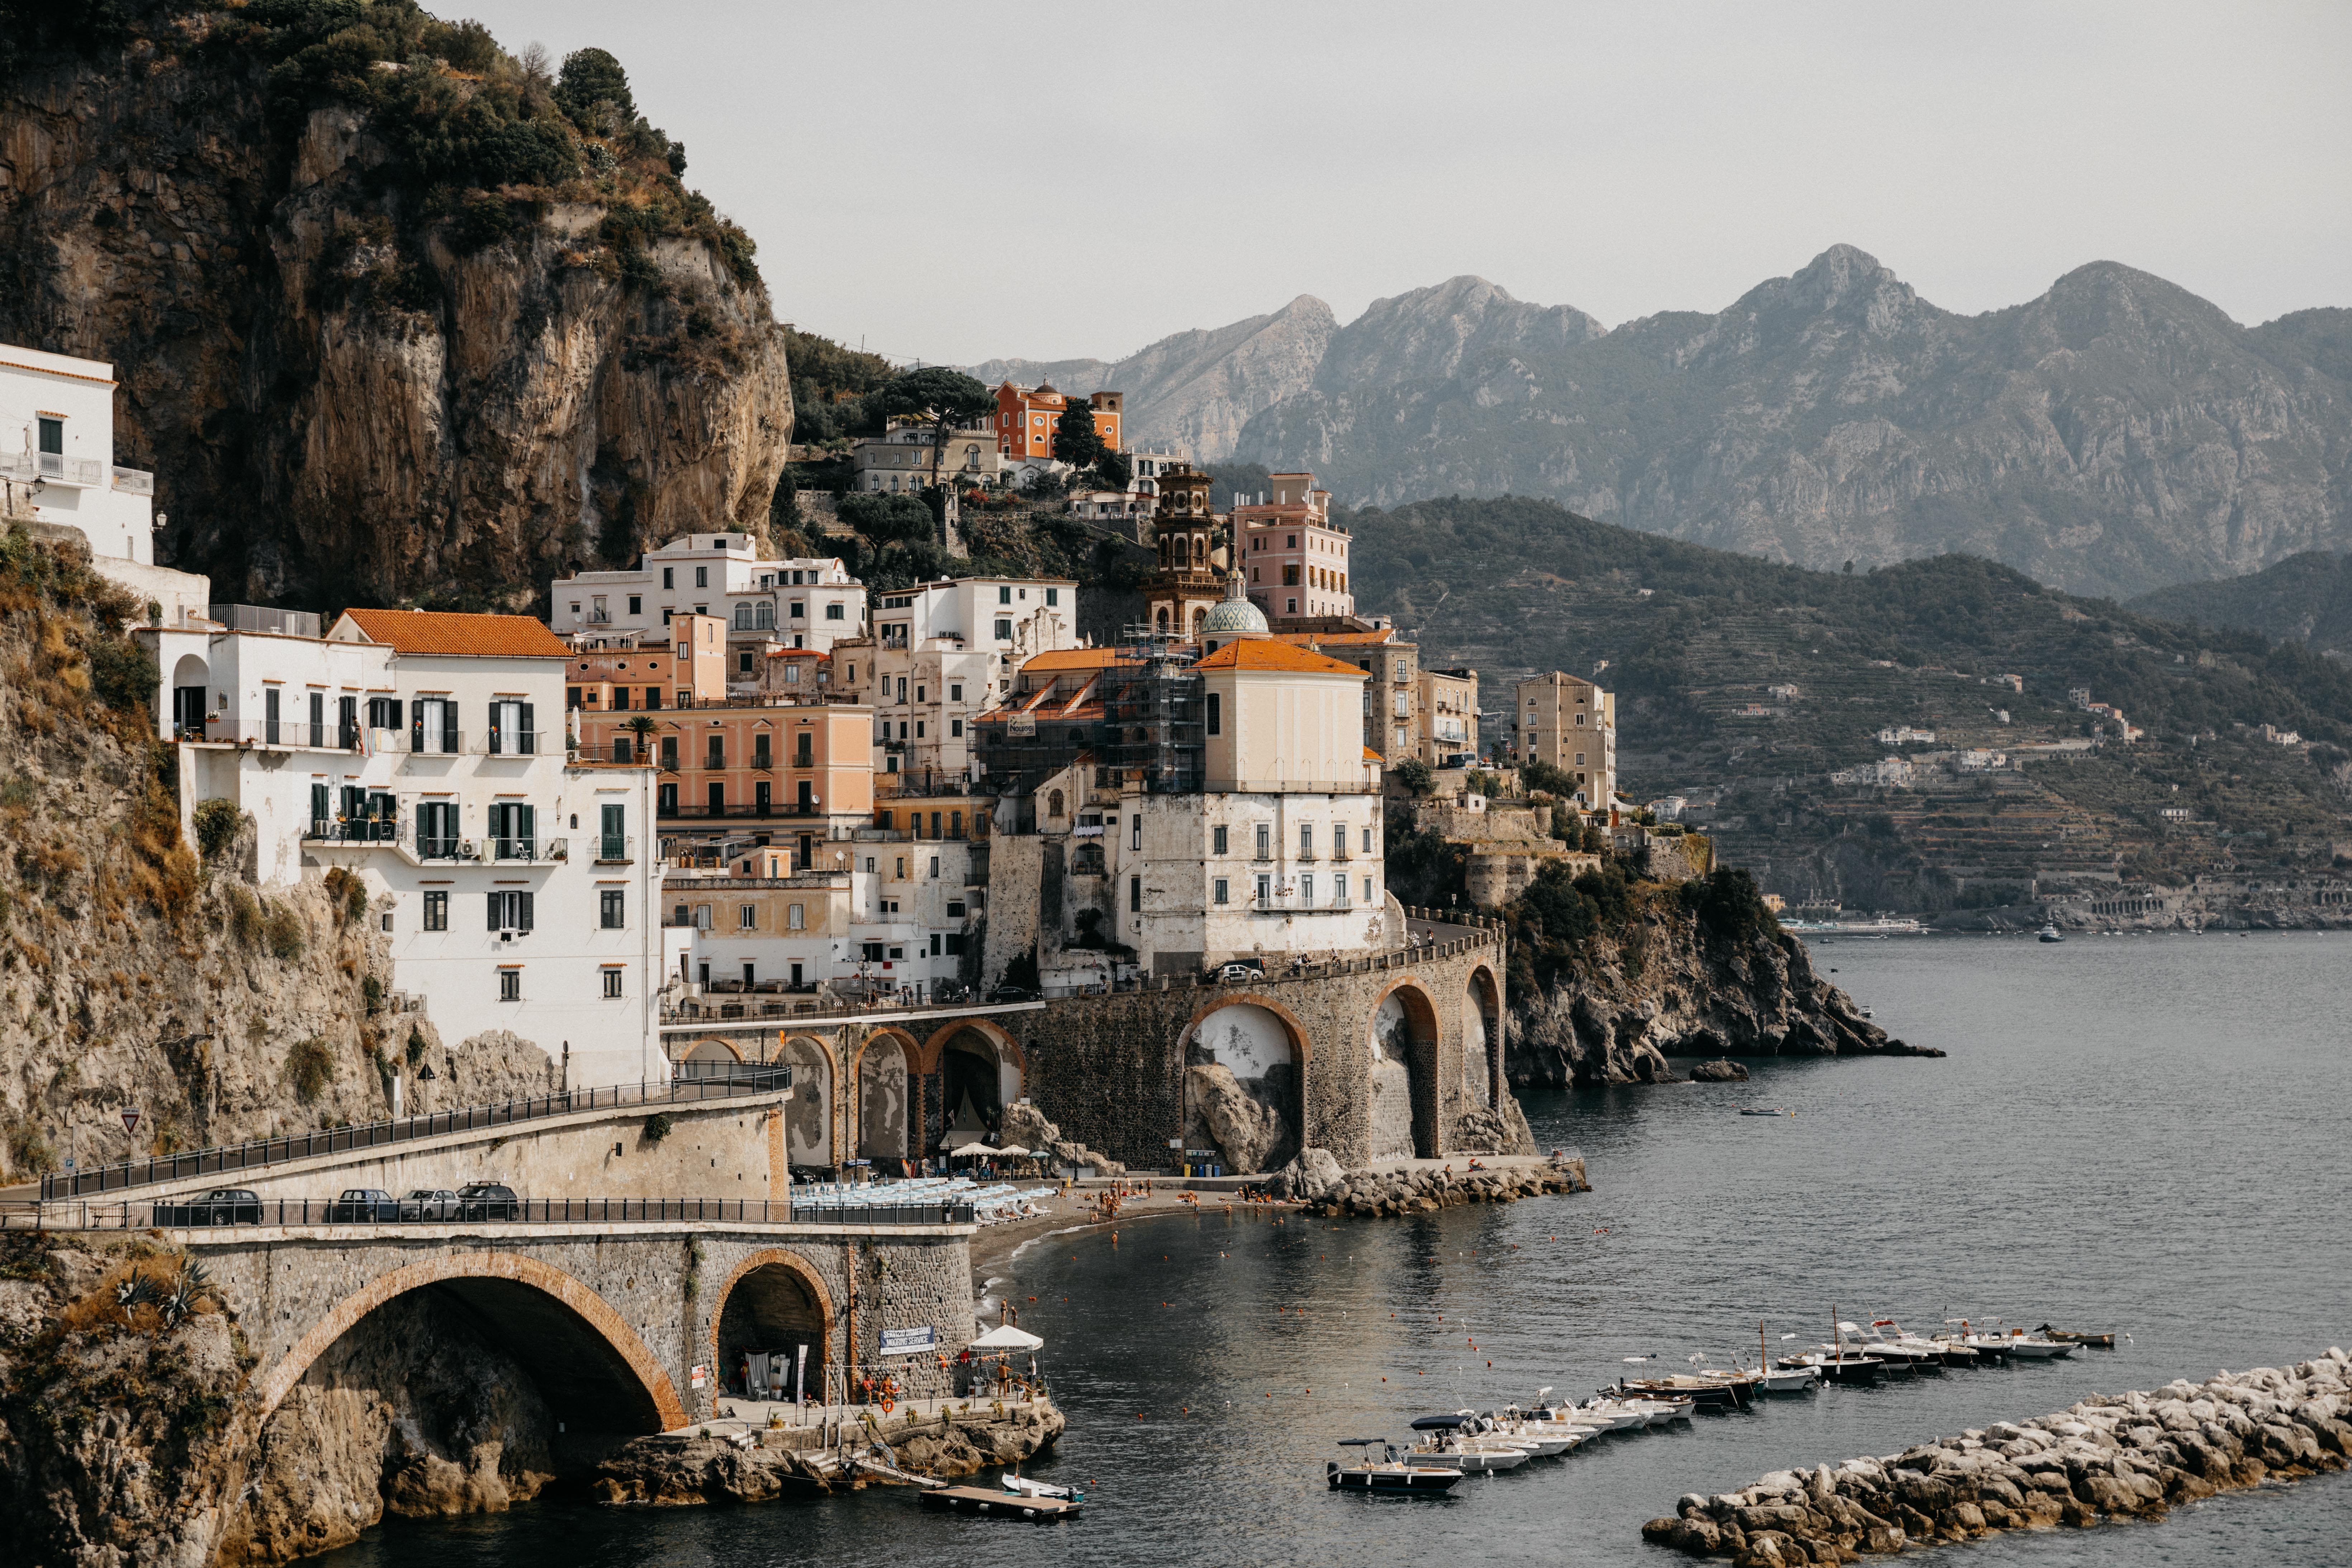 Italy Amalfi Coast Alexandra Adoncello, for a Q&A with Travis.